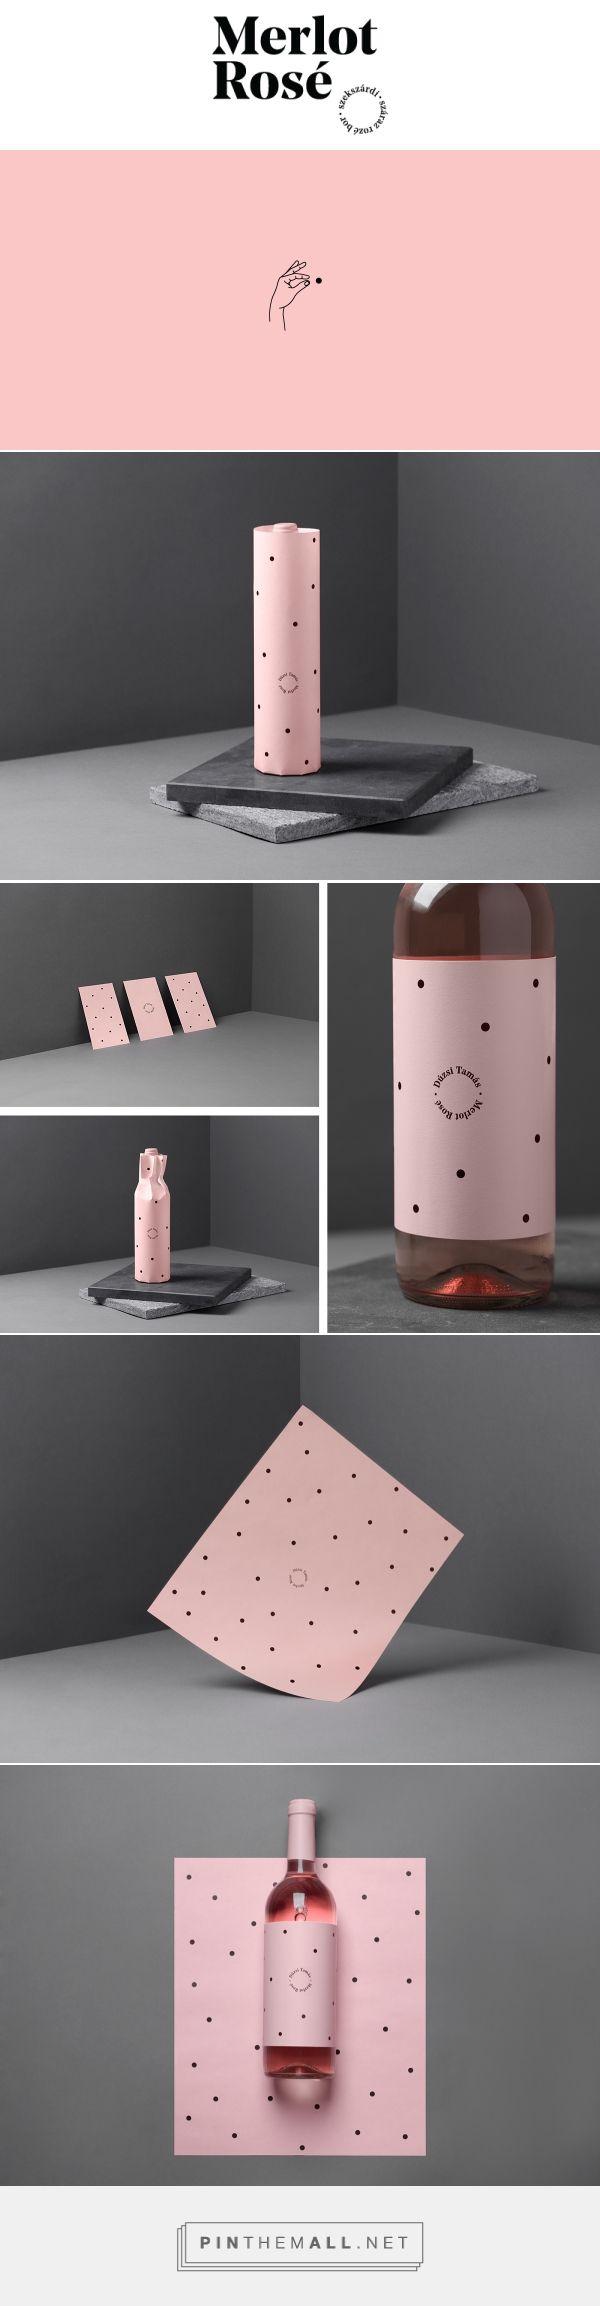 Duzsi Tamas Merlot Rose Wine Packaging by Kira Koroknai | Fivestar Branding Agency – Design and Branding Agency & Curated Inspiration Gallery